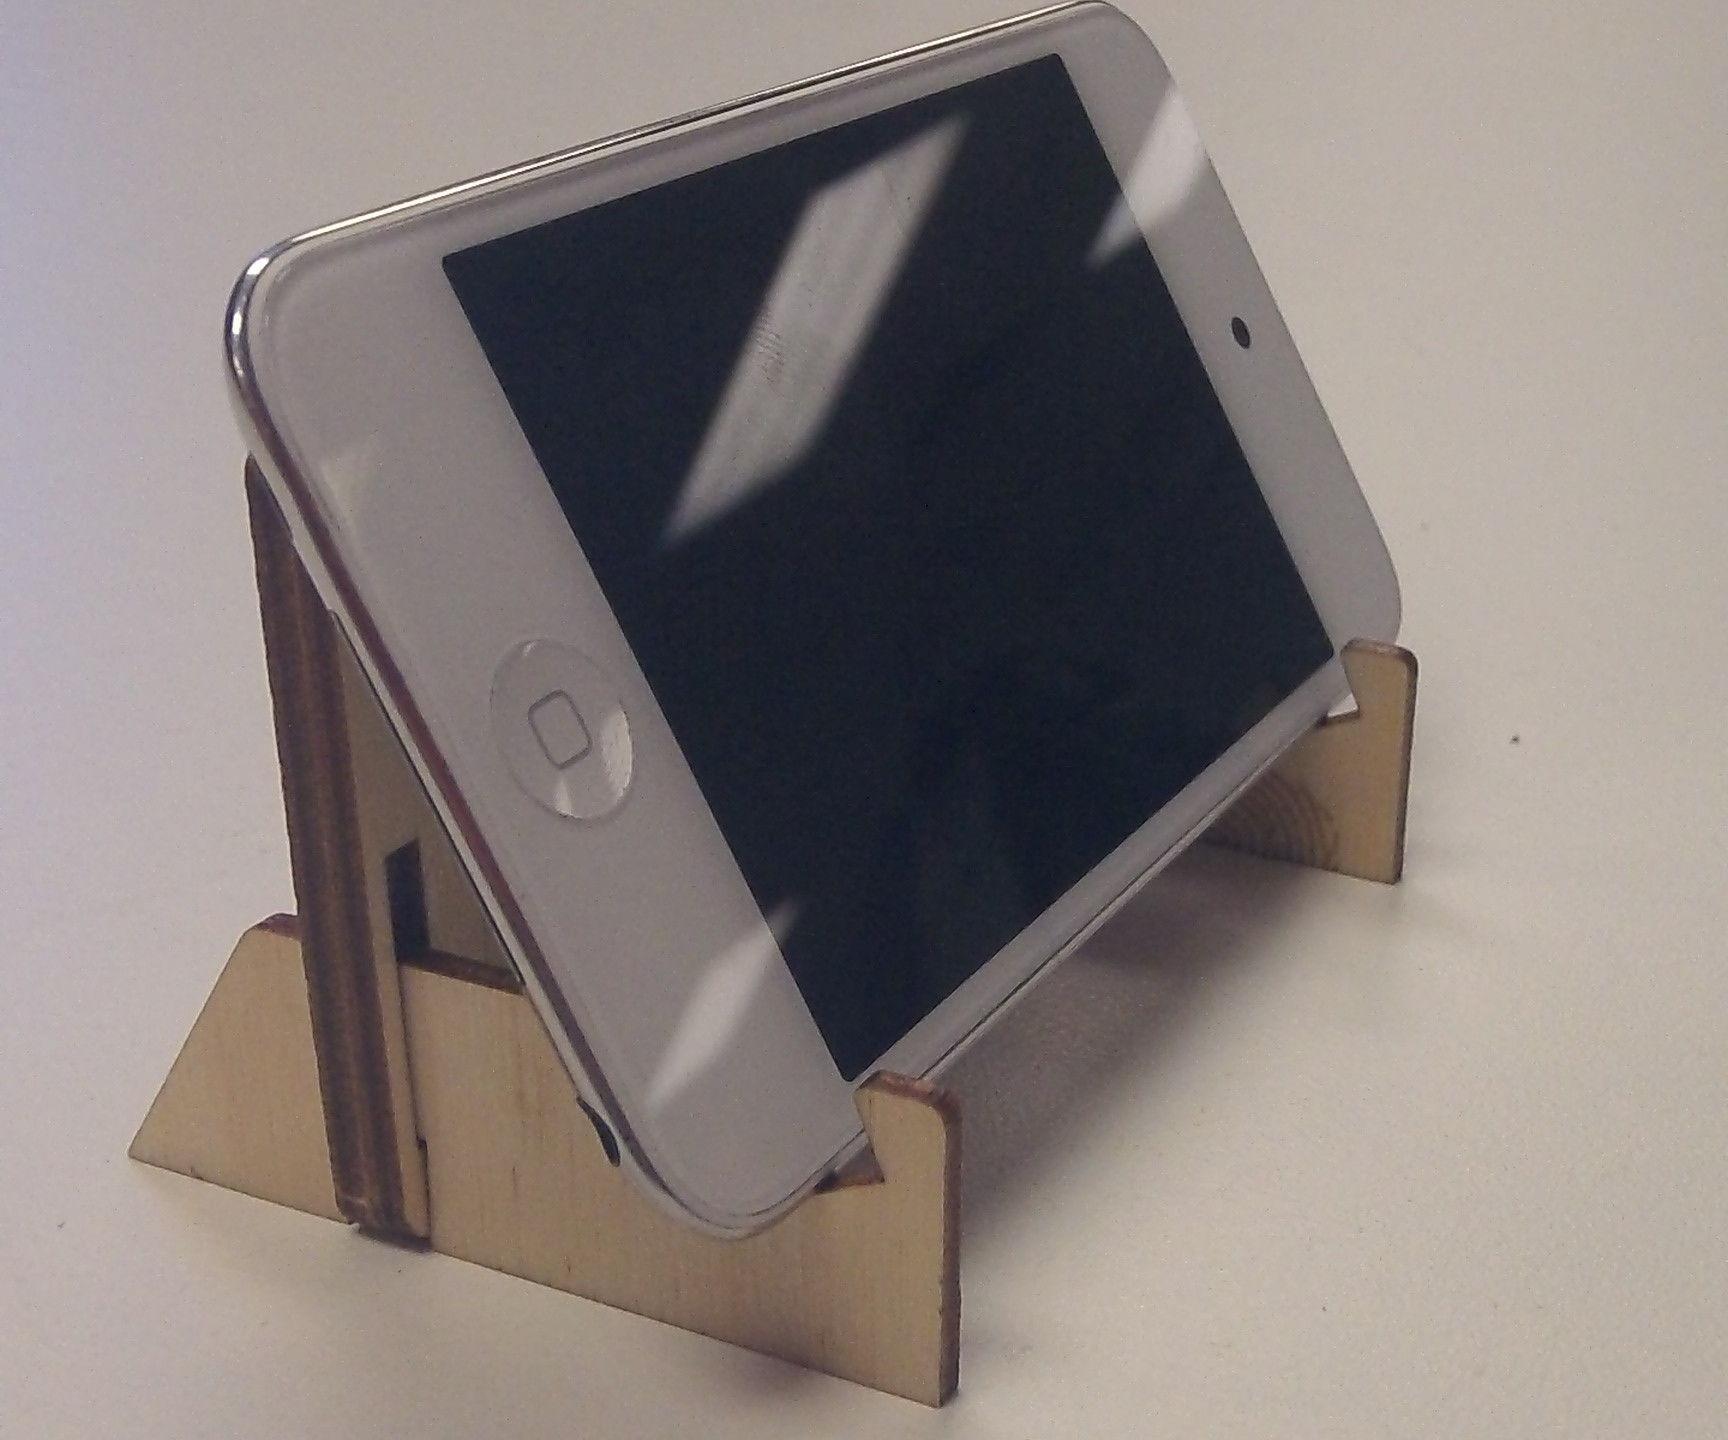 Slim phone stand